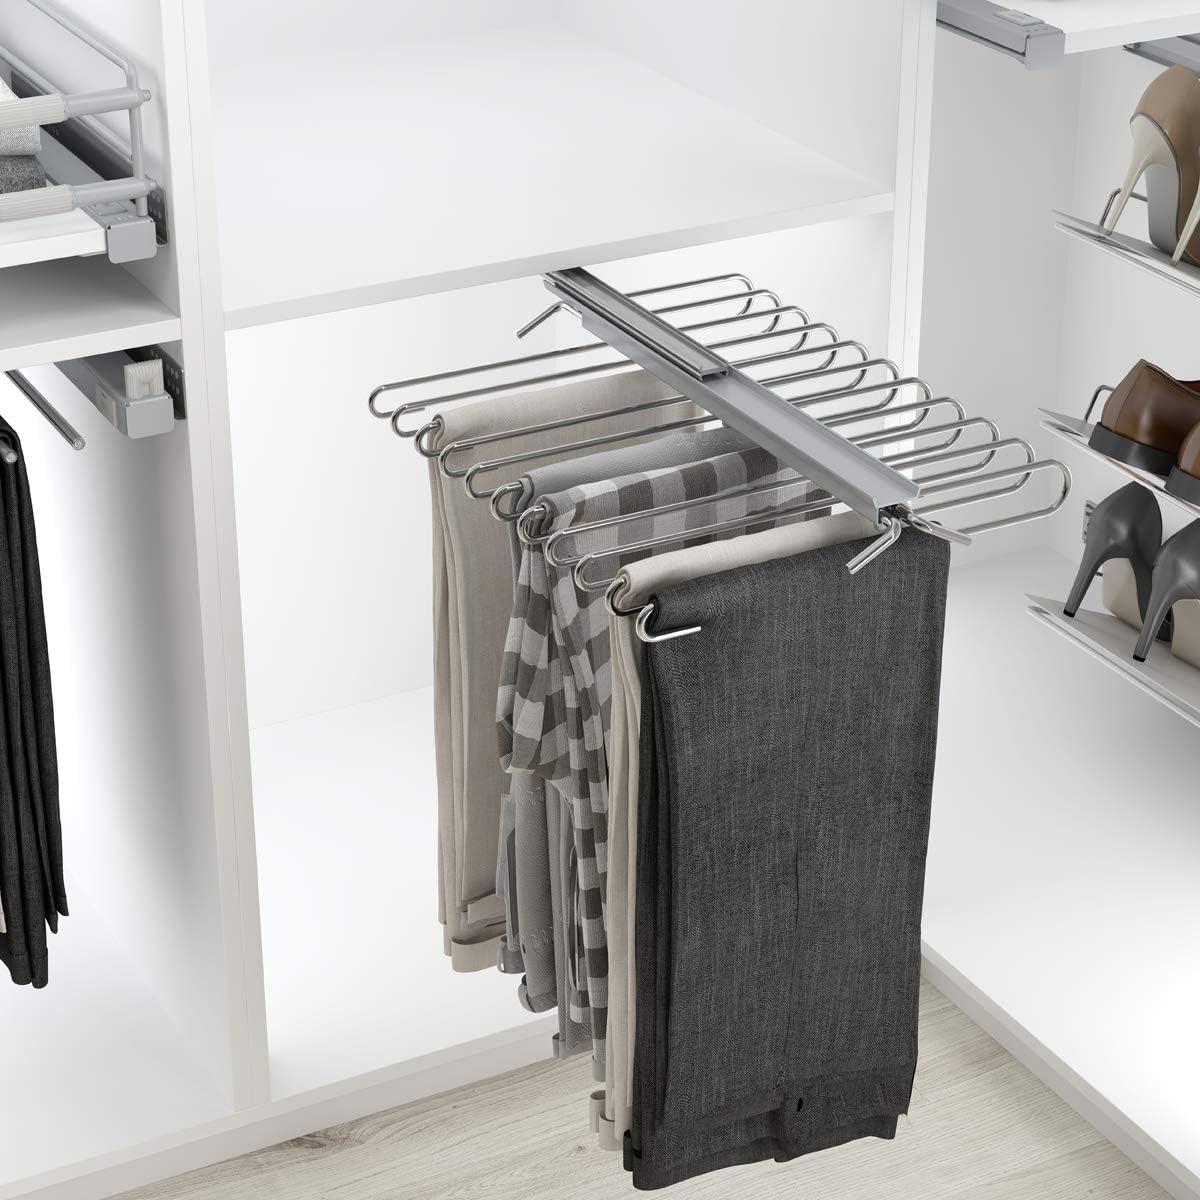 Casaenorden - Pantalonero extraíble Reversible - 9 ó 11 Pantalones - Perchero para Pantalones - para 9 Pantalones: Amazon.es: Hogar